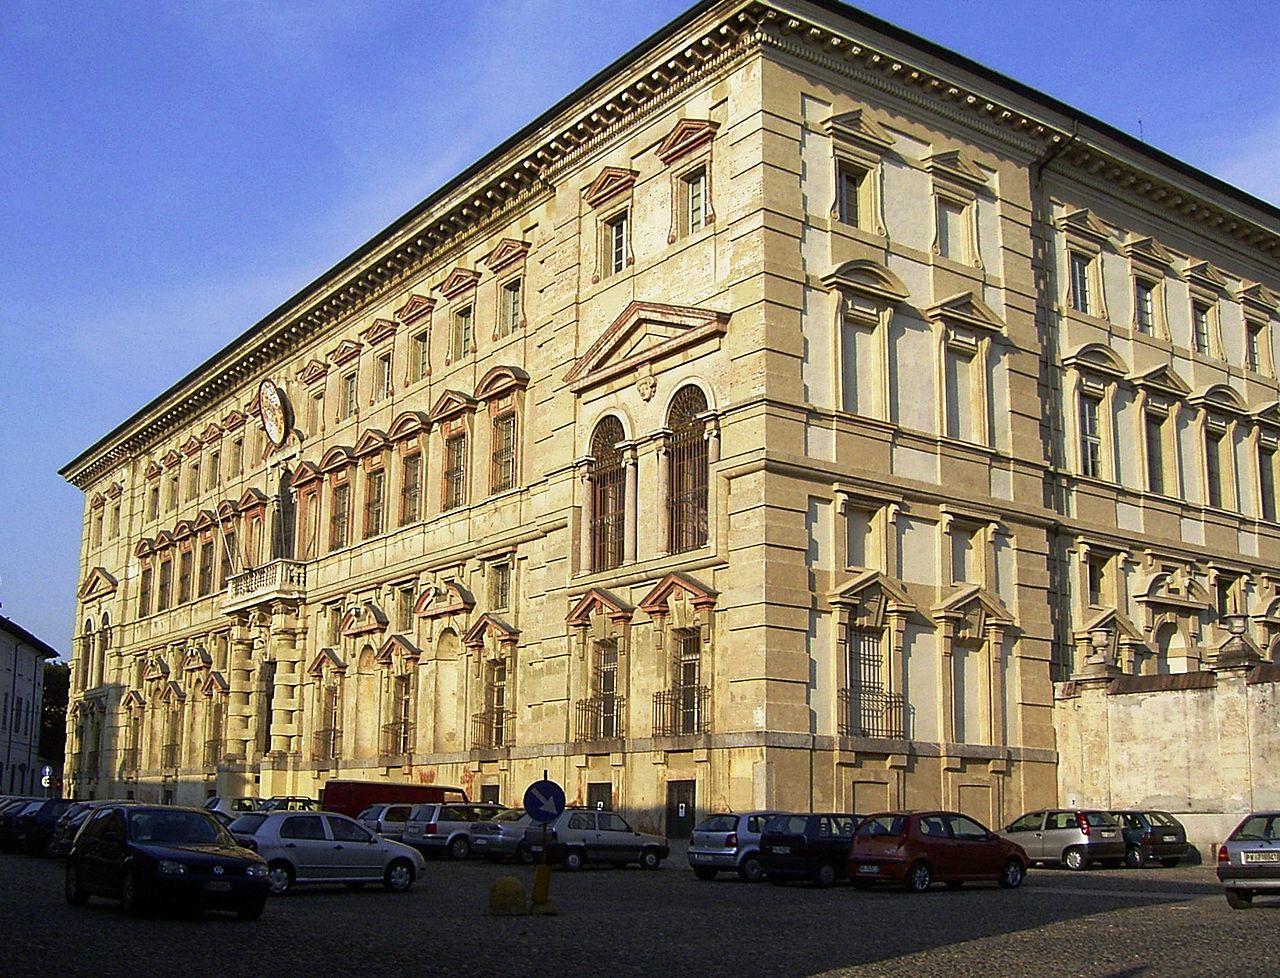 Collegio Borromeo